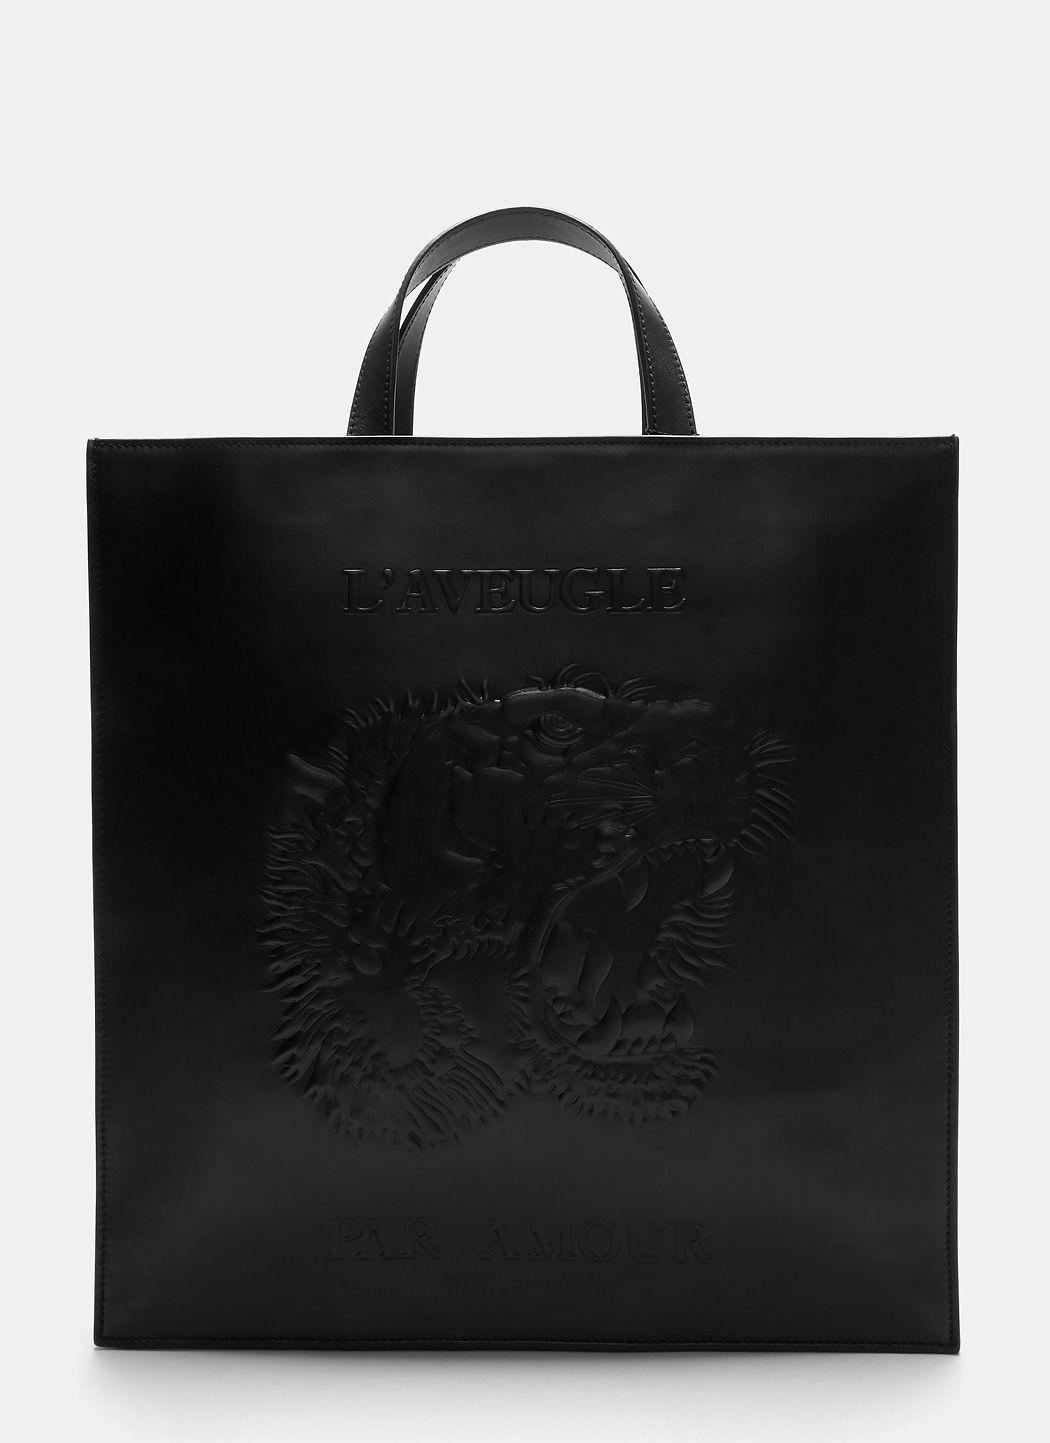 Gucci Men's Embossed Leather L'Aveugle Par Amour Tiger Tote, Black